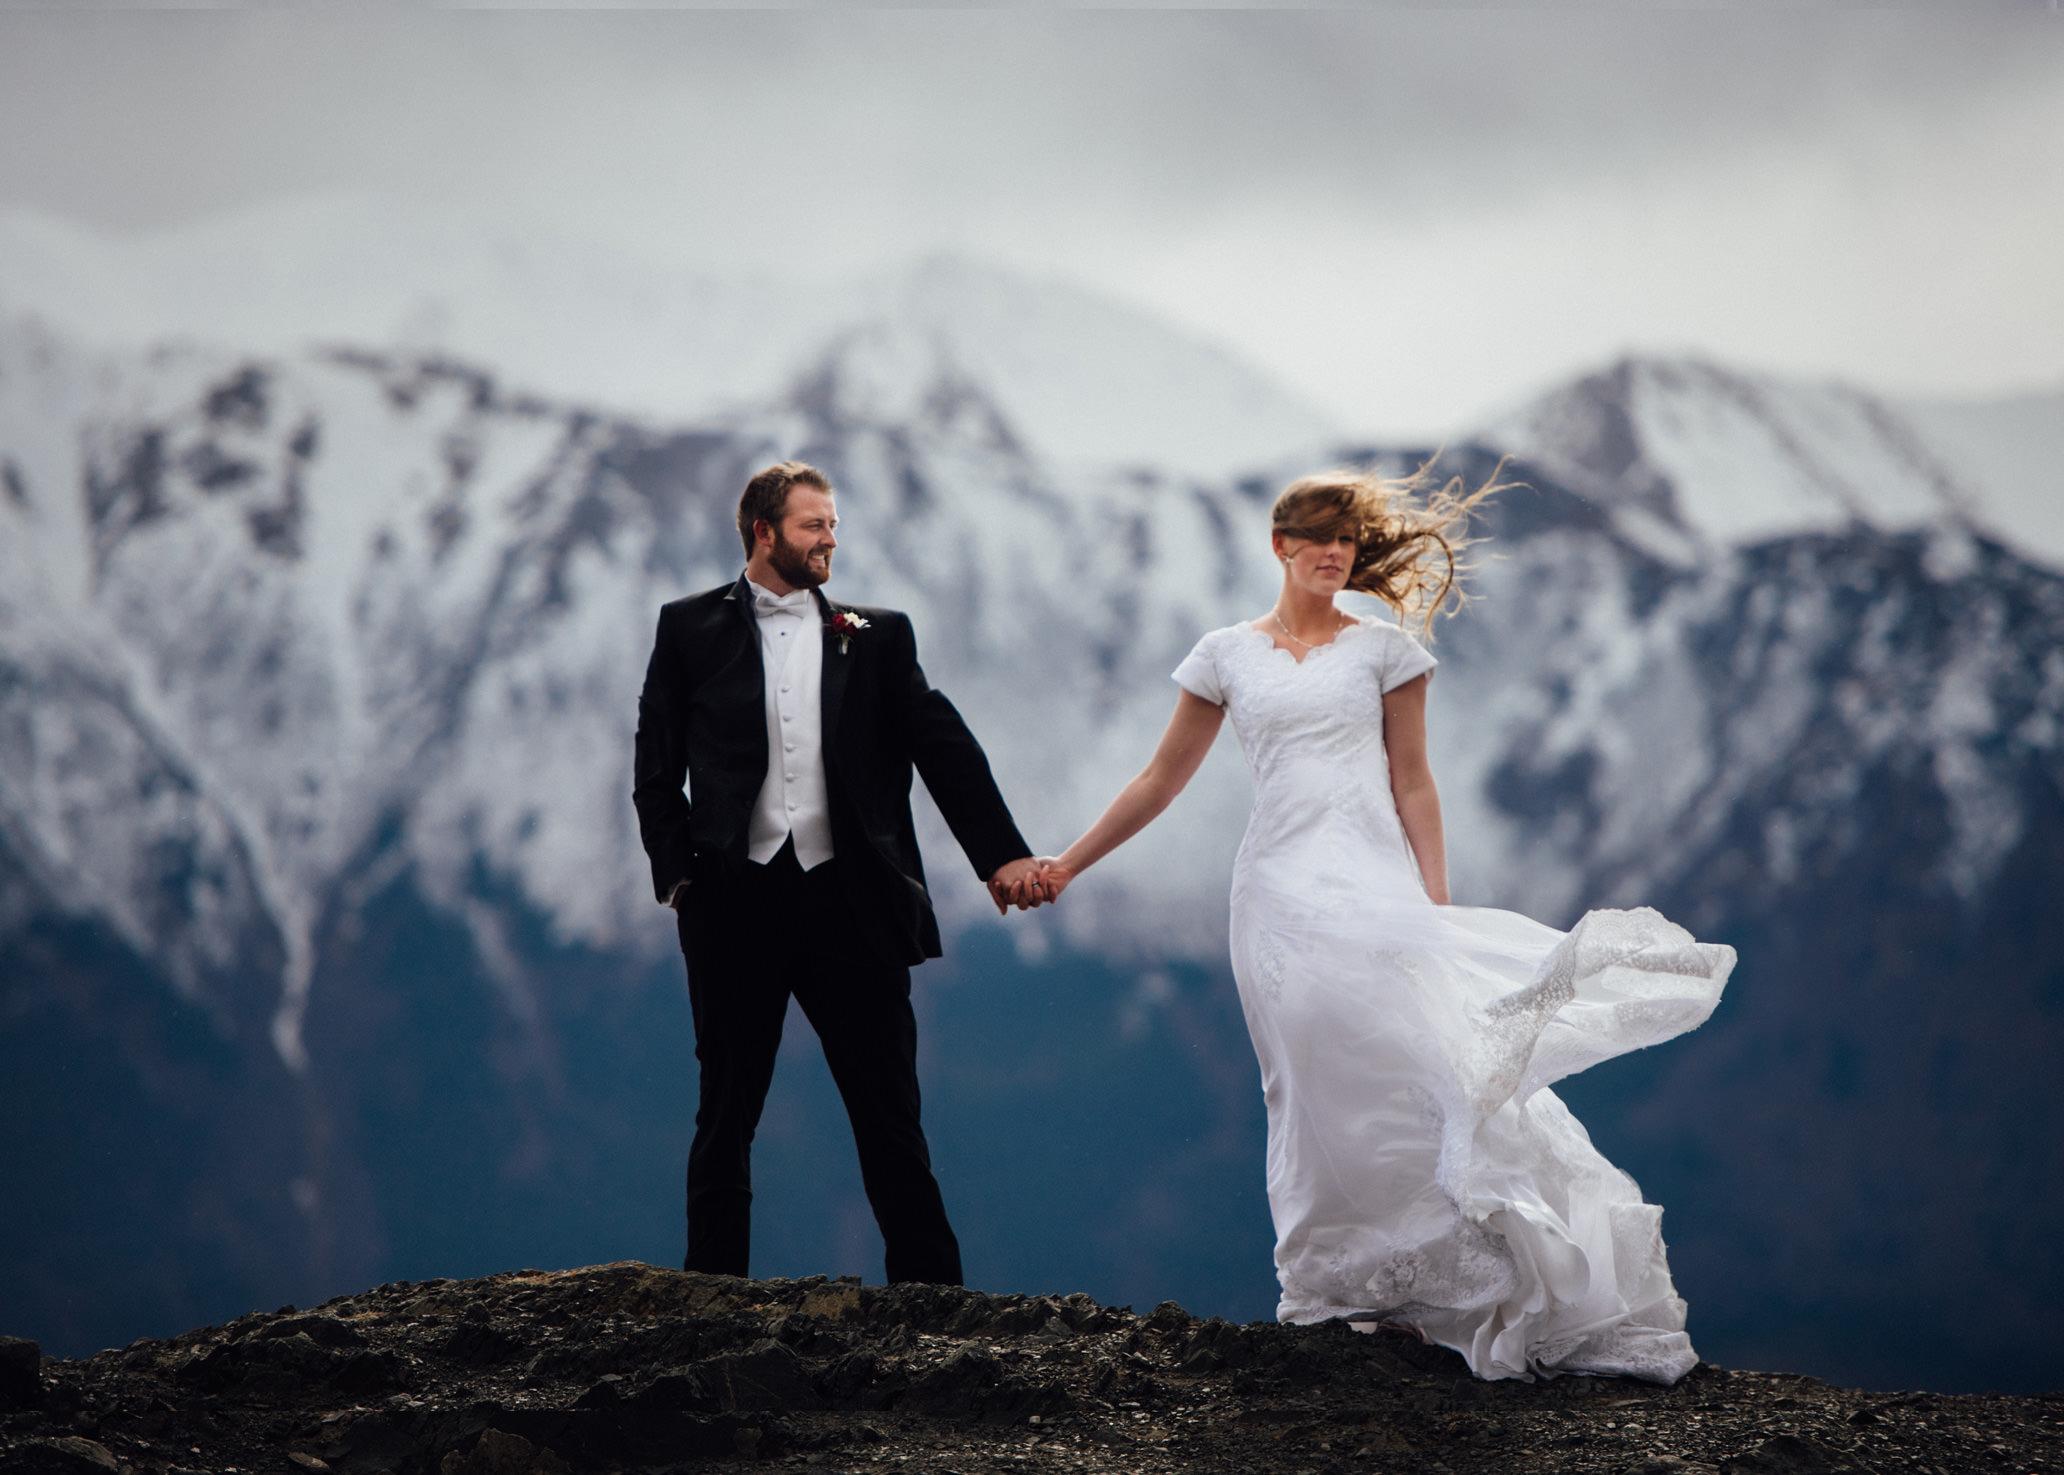 Weddings Engagements Seniors Catie Bartlett